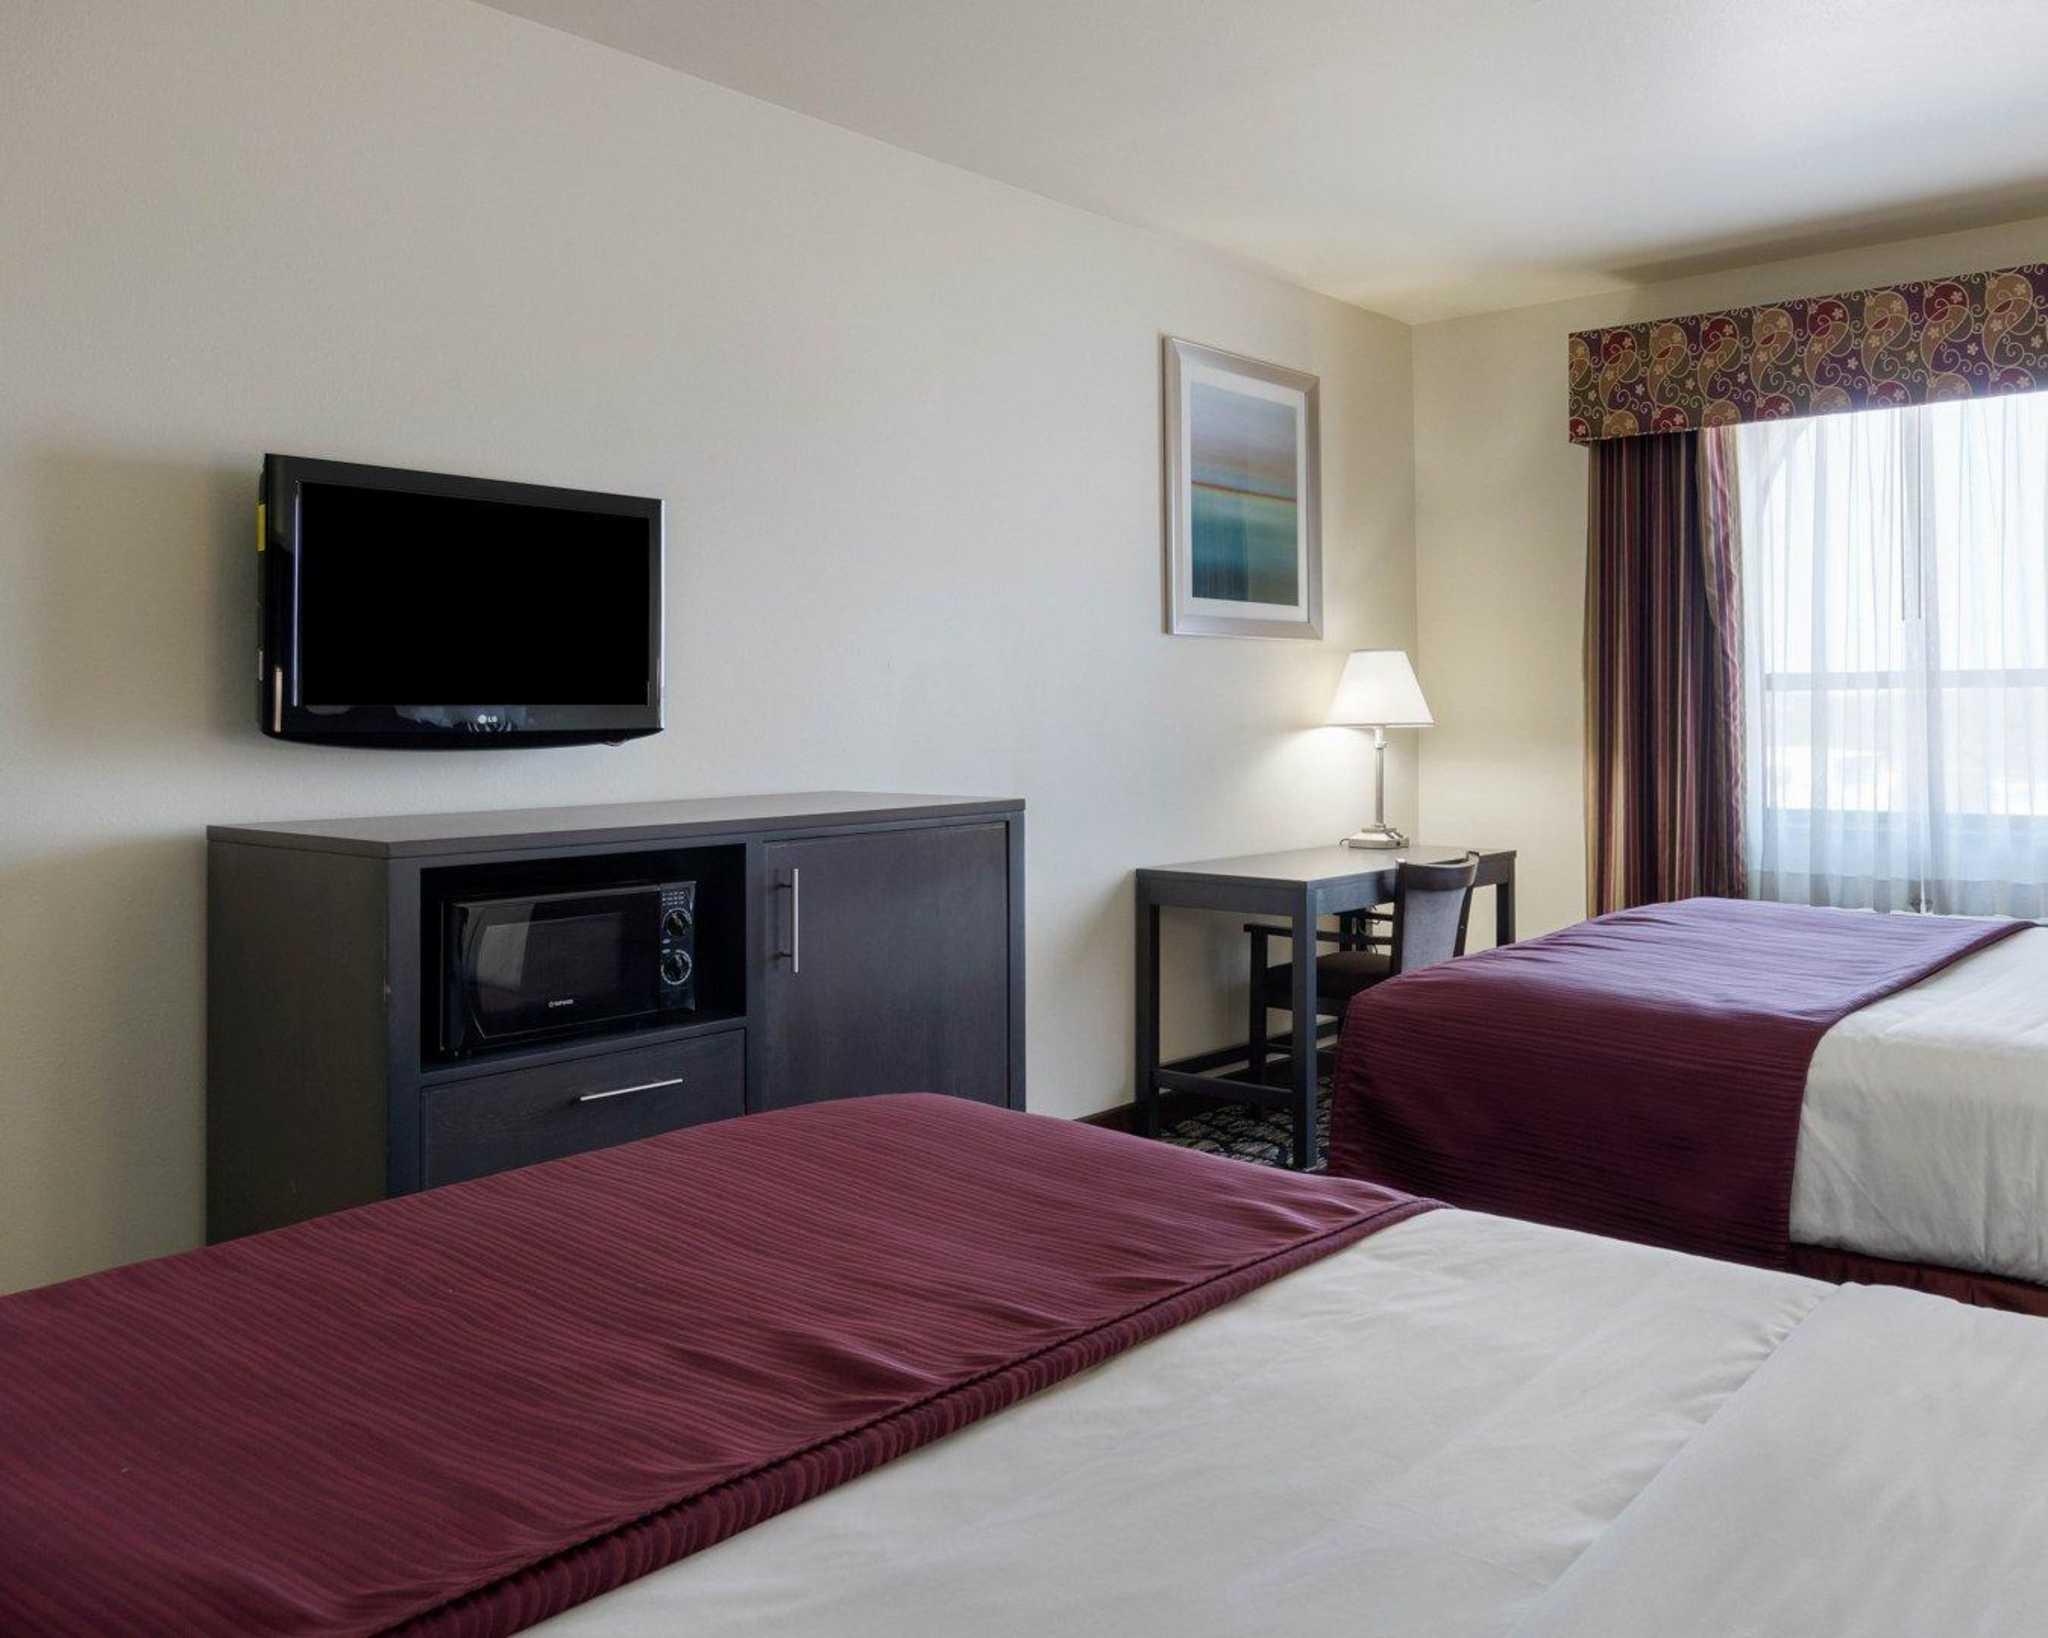 Quality Inn image 7